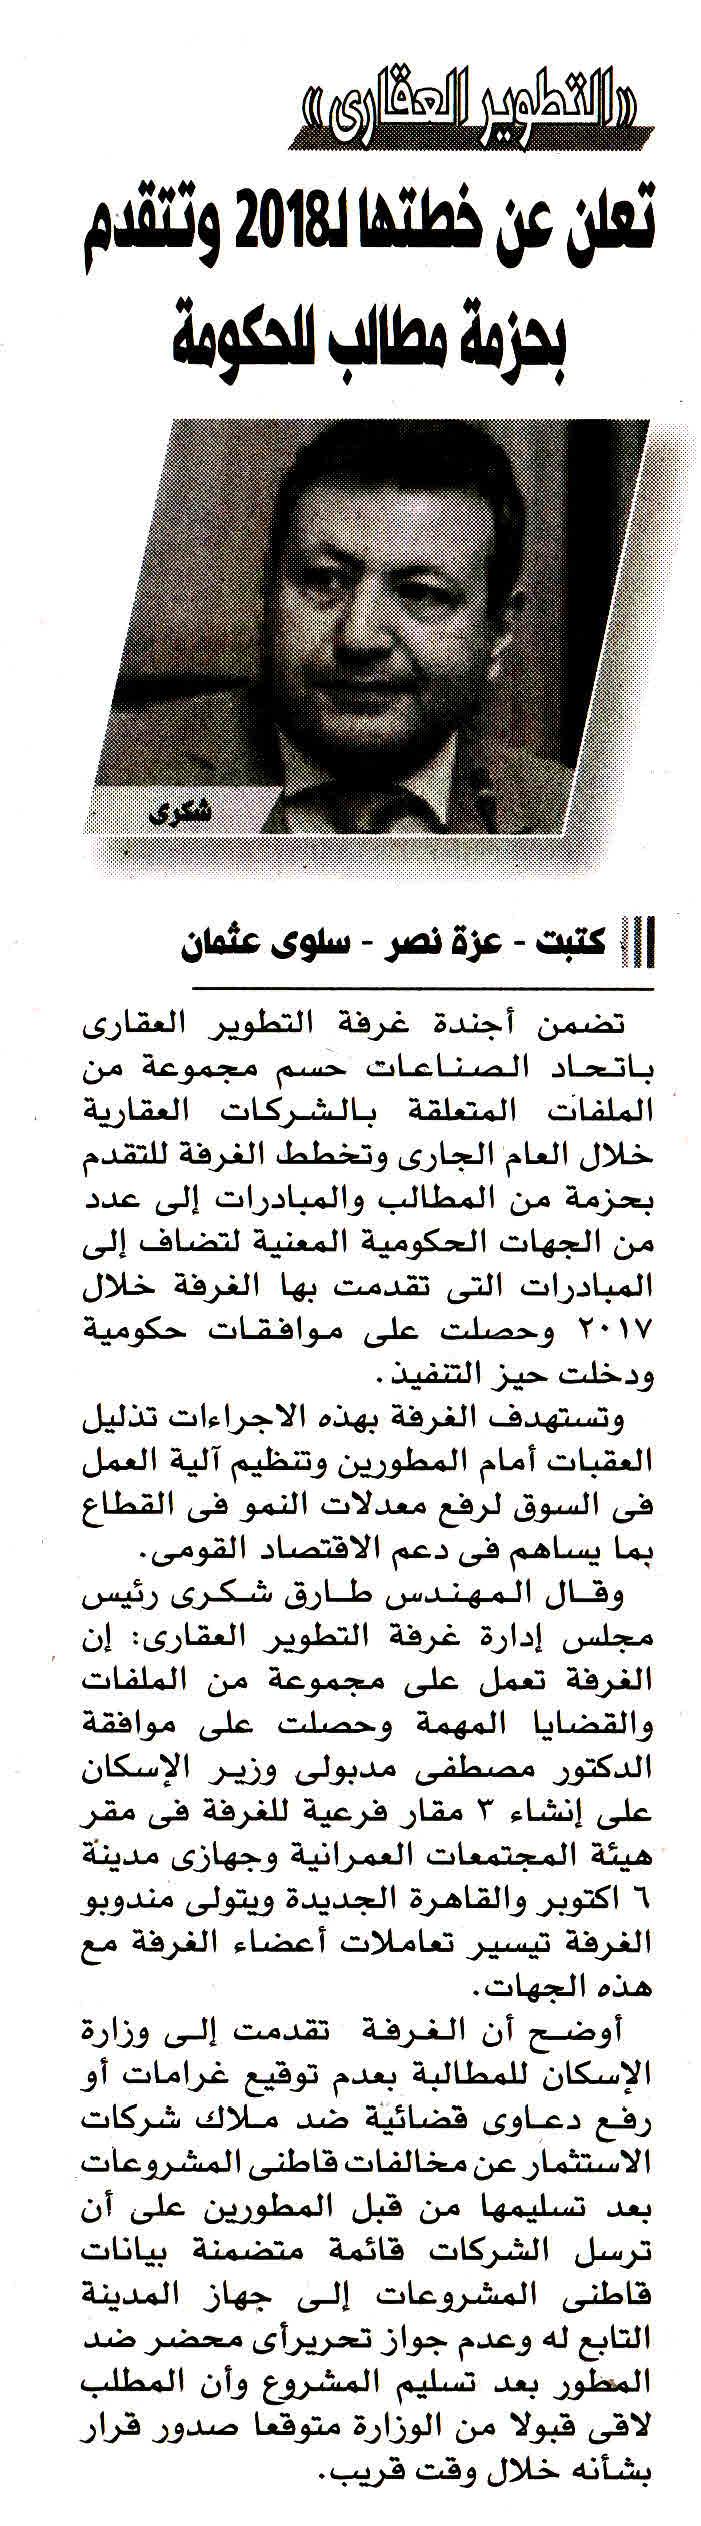 Rosa Al Youssef 7 March P.7.jpg